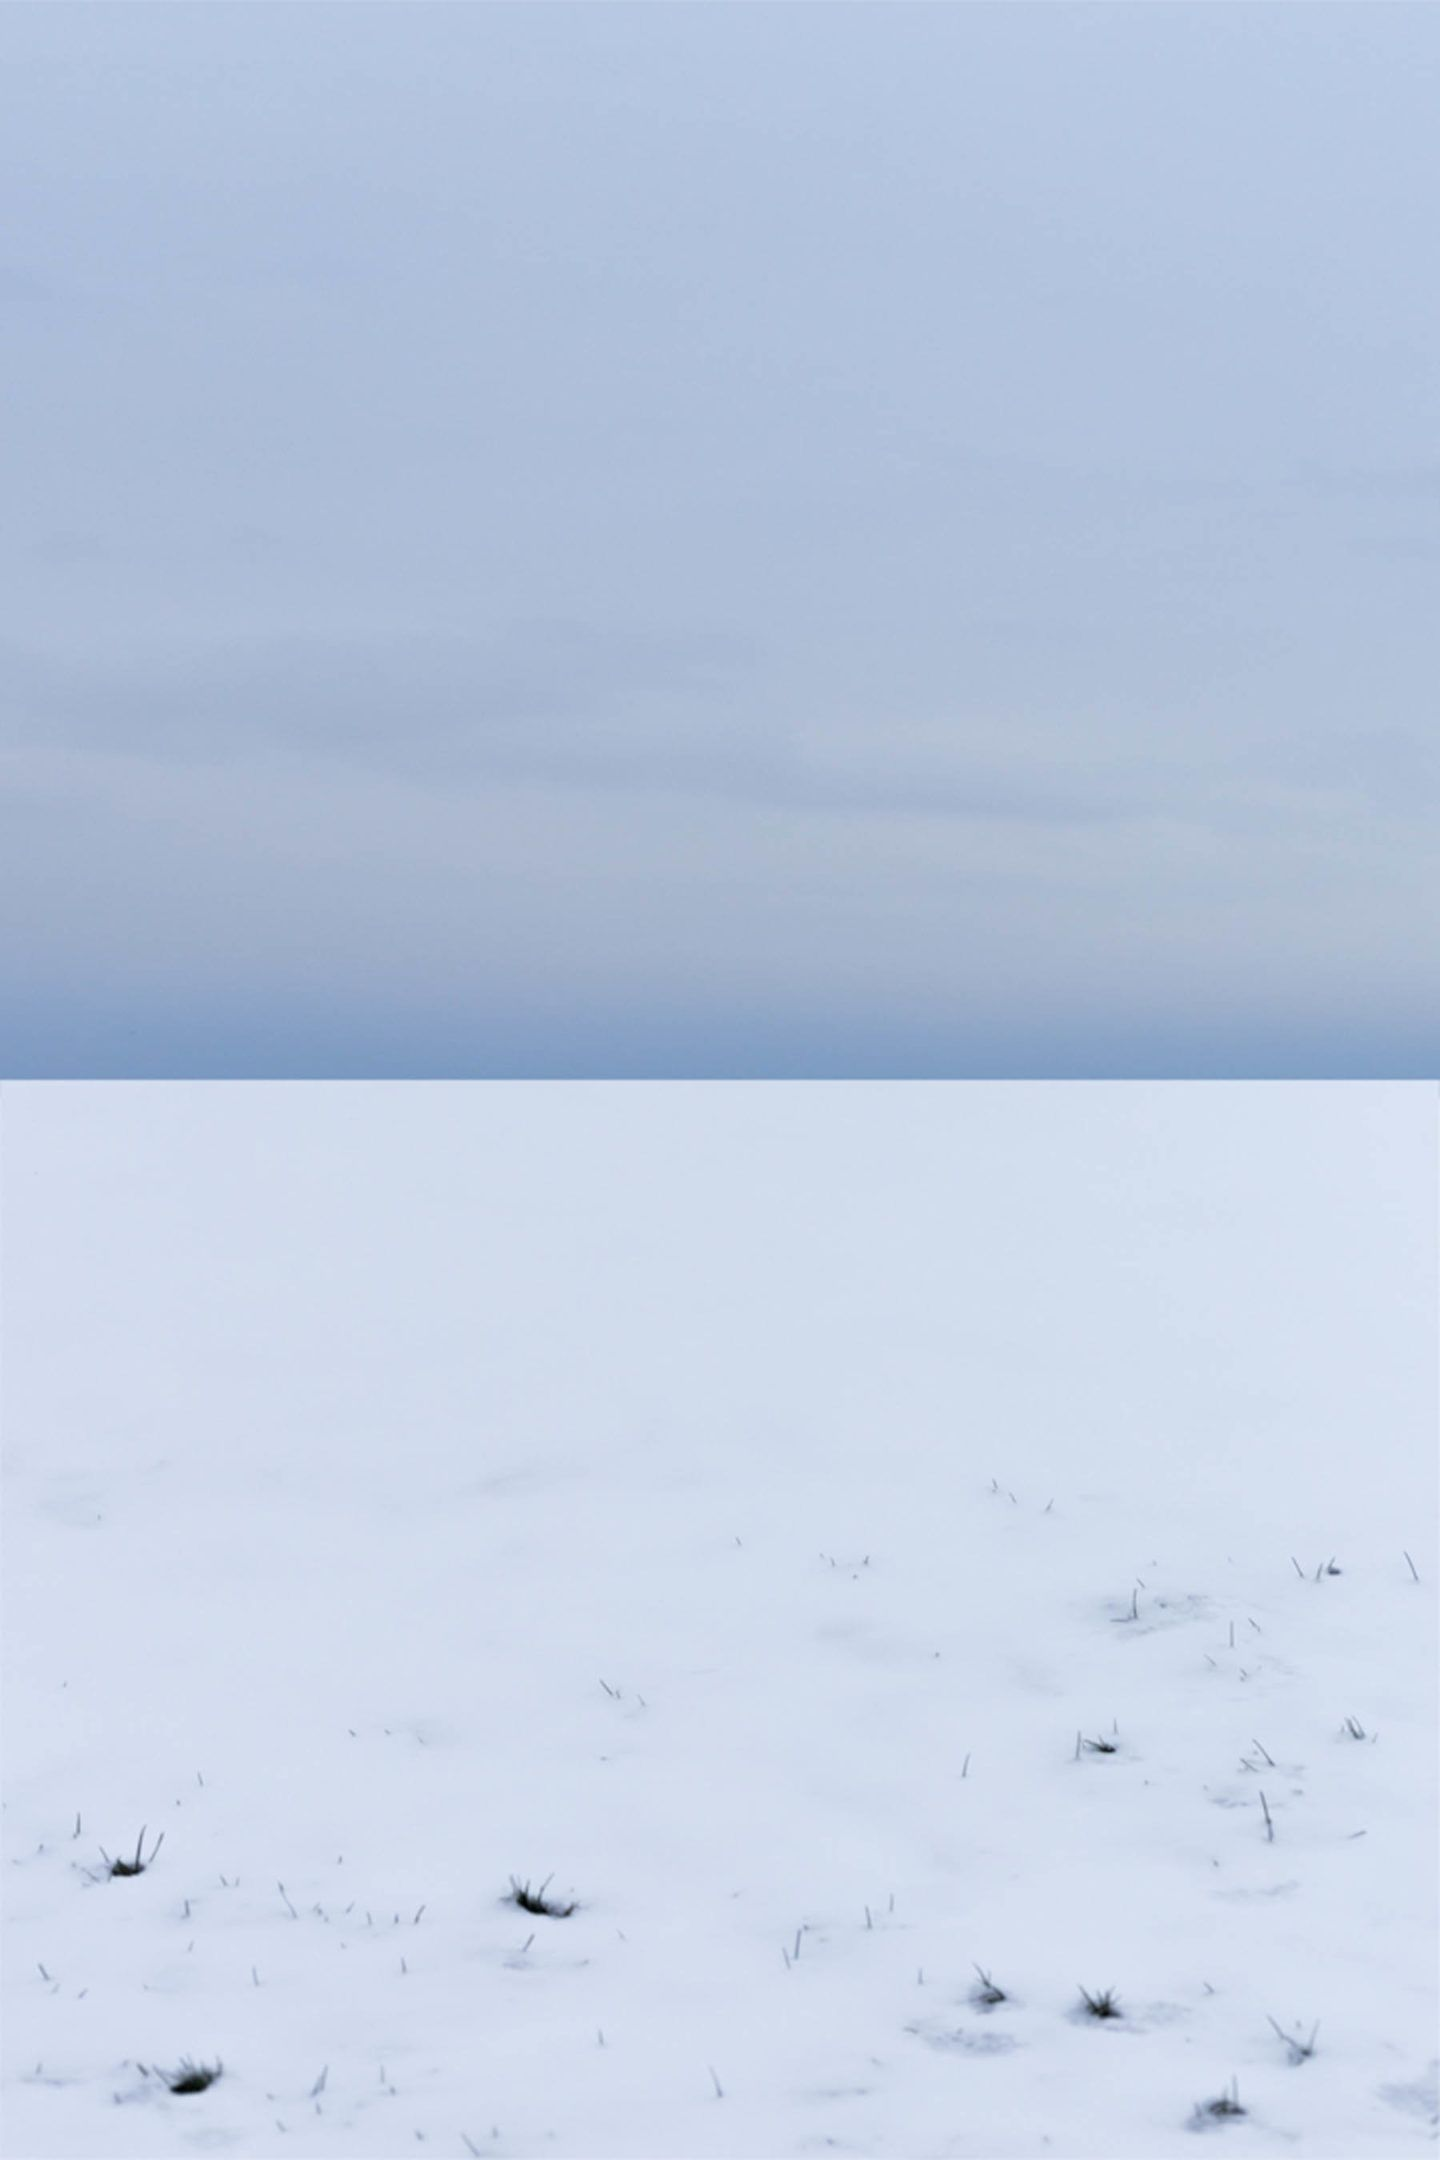 IGNANT-Photography-Naohiro-Maeda-Passages-0010